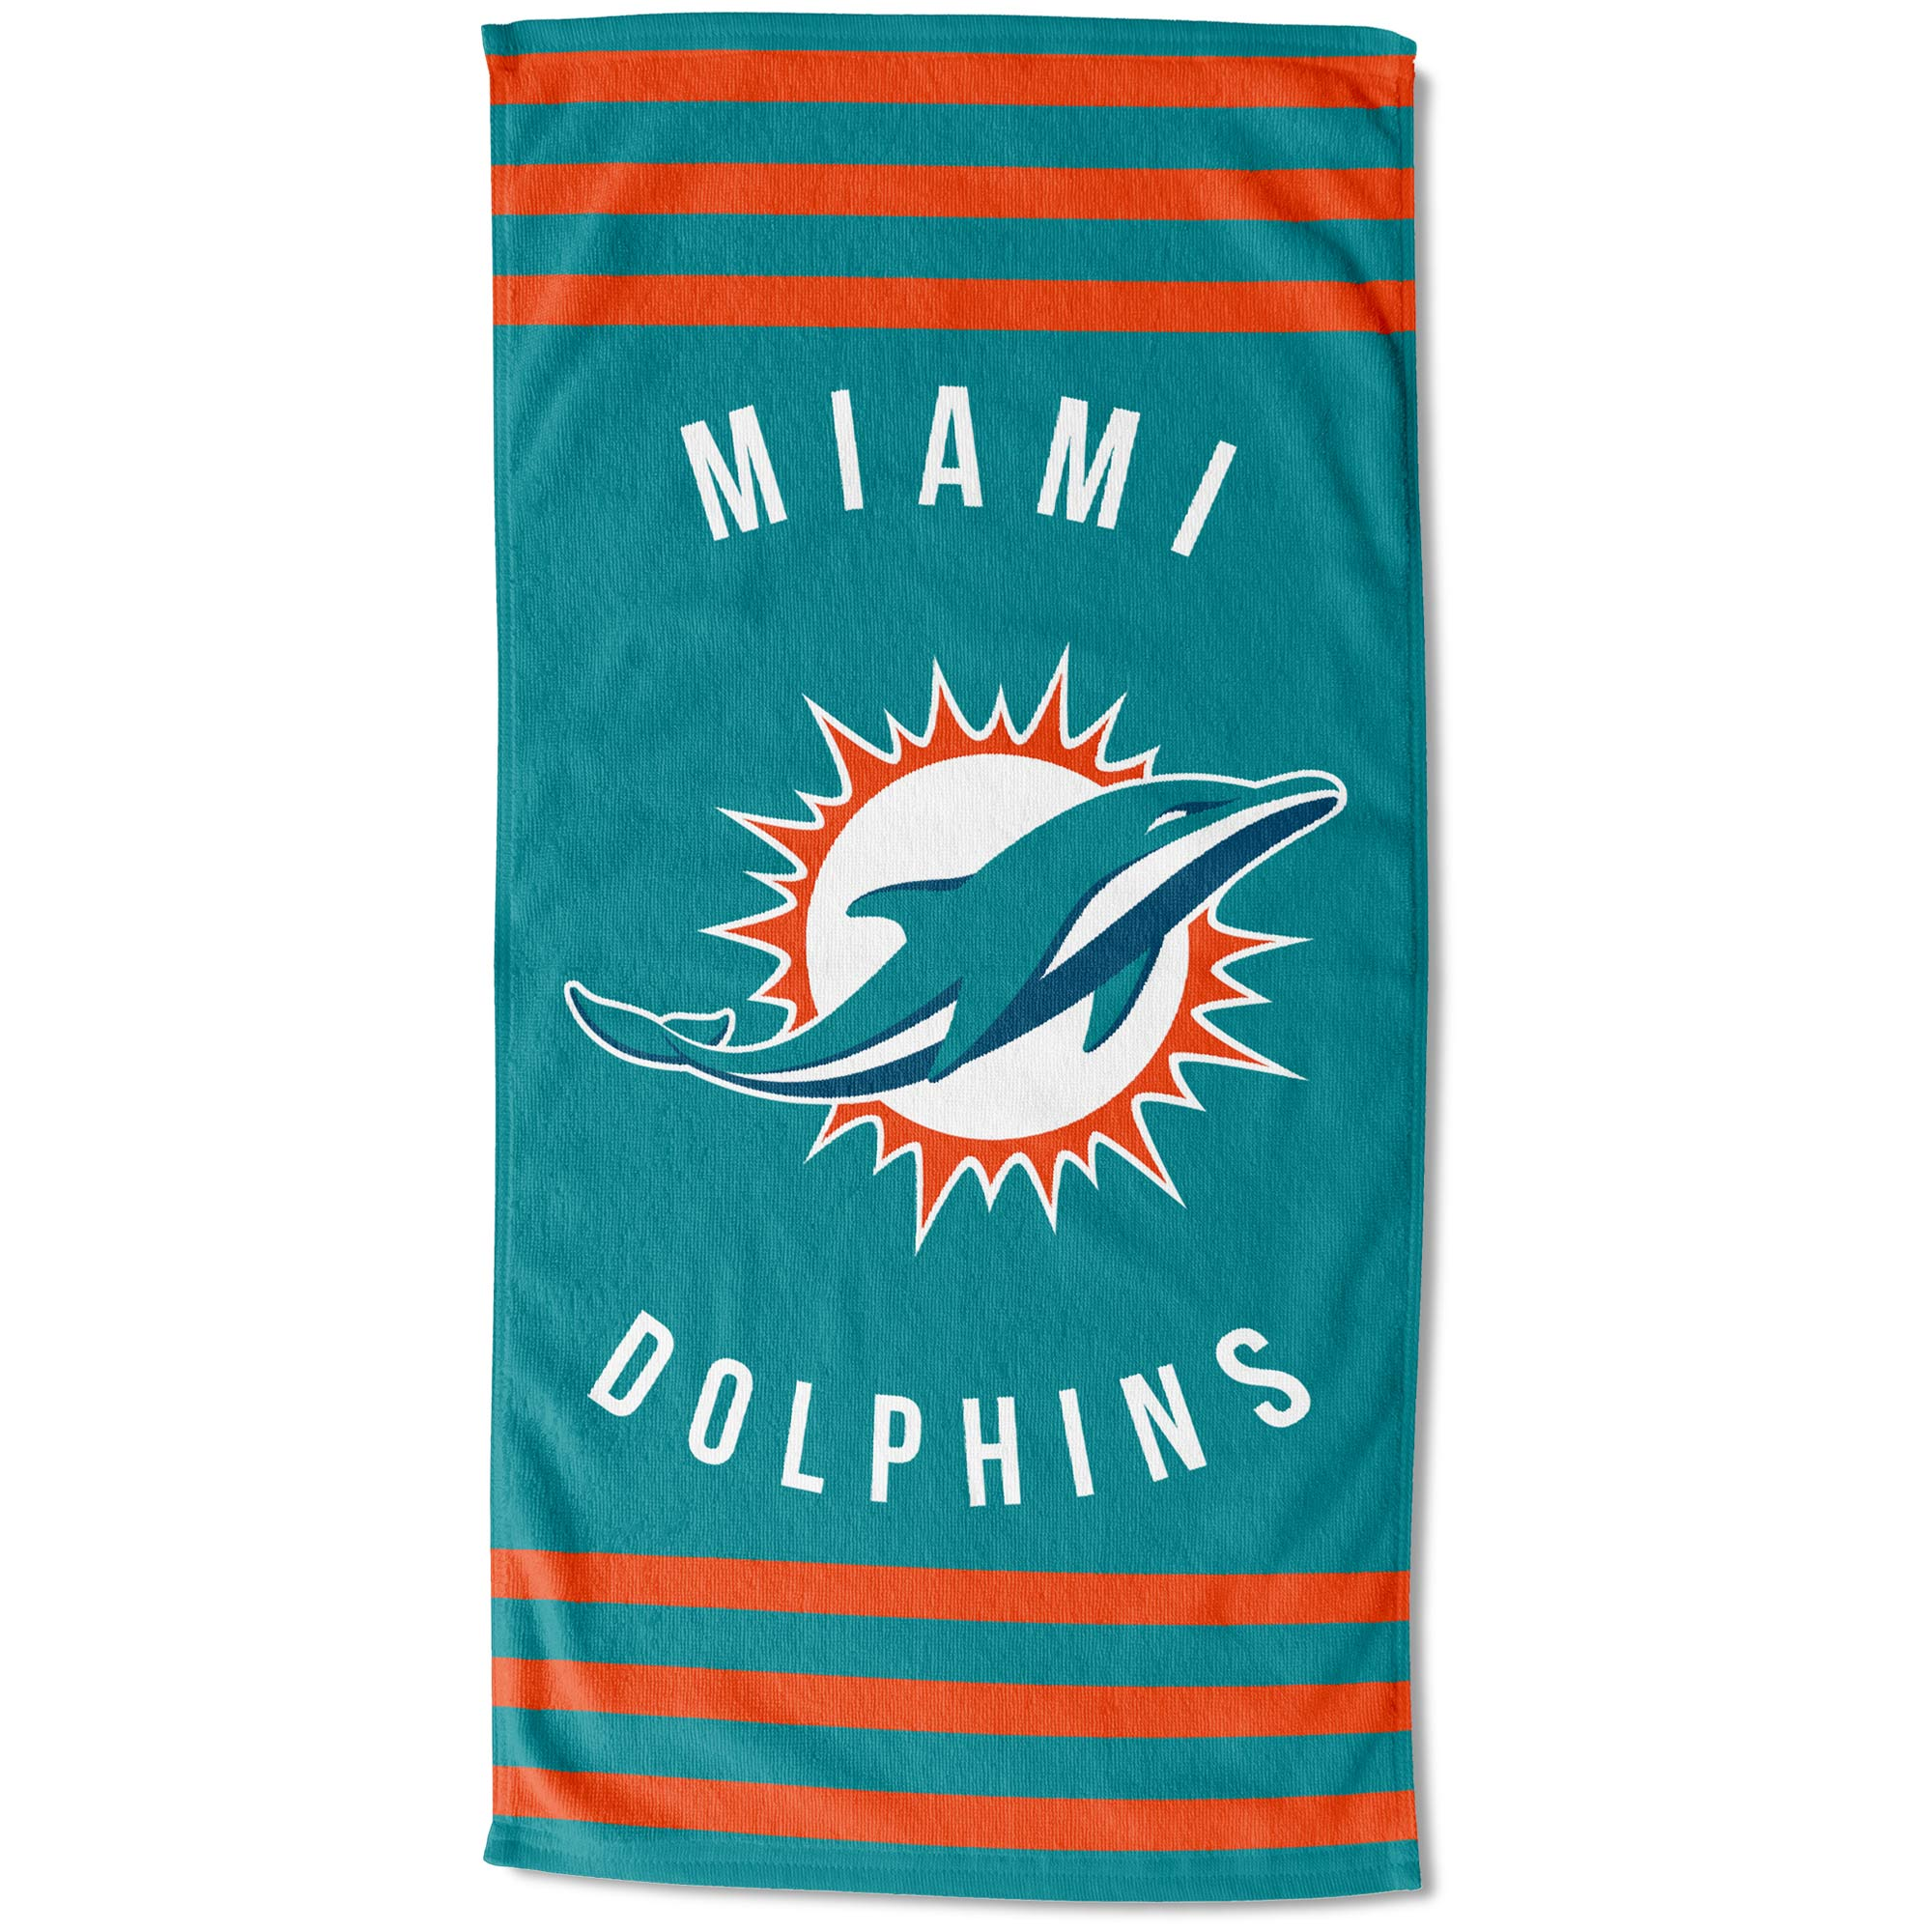 "Miami Dolphins The Northwest Company 30"" x 60"" Striped Beach Towel - No Size"